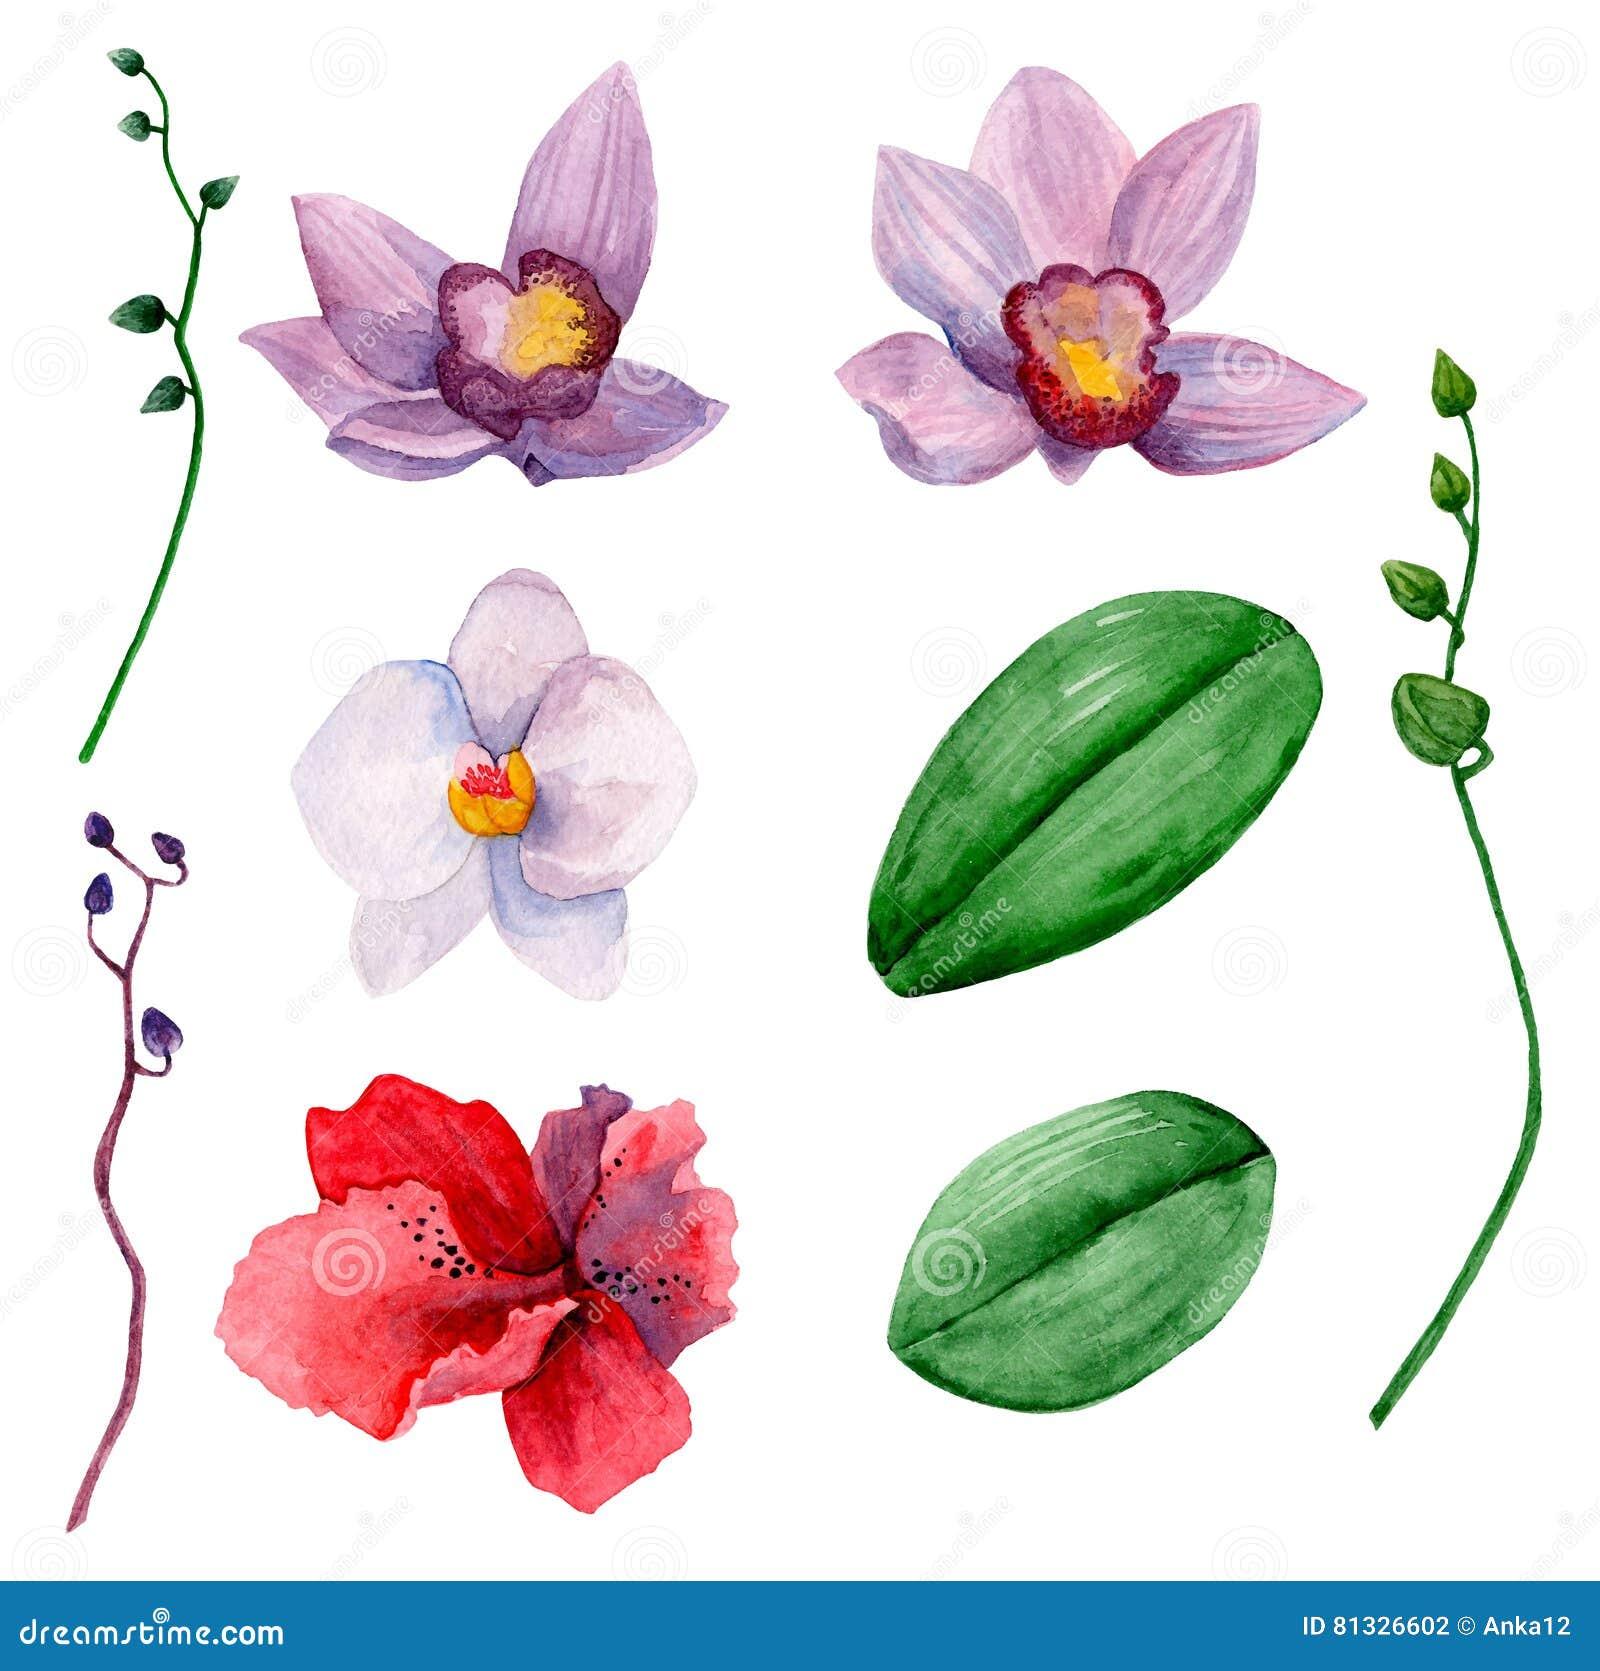 Hawaiian flowers vector clipart stock vector illustration of hawaiian flowers vector clipart izmirmasajfo